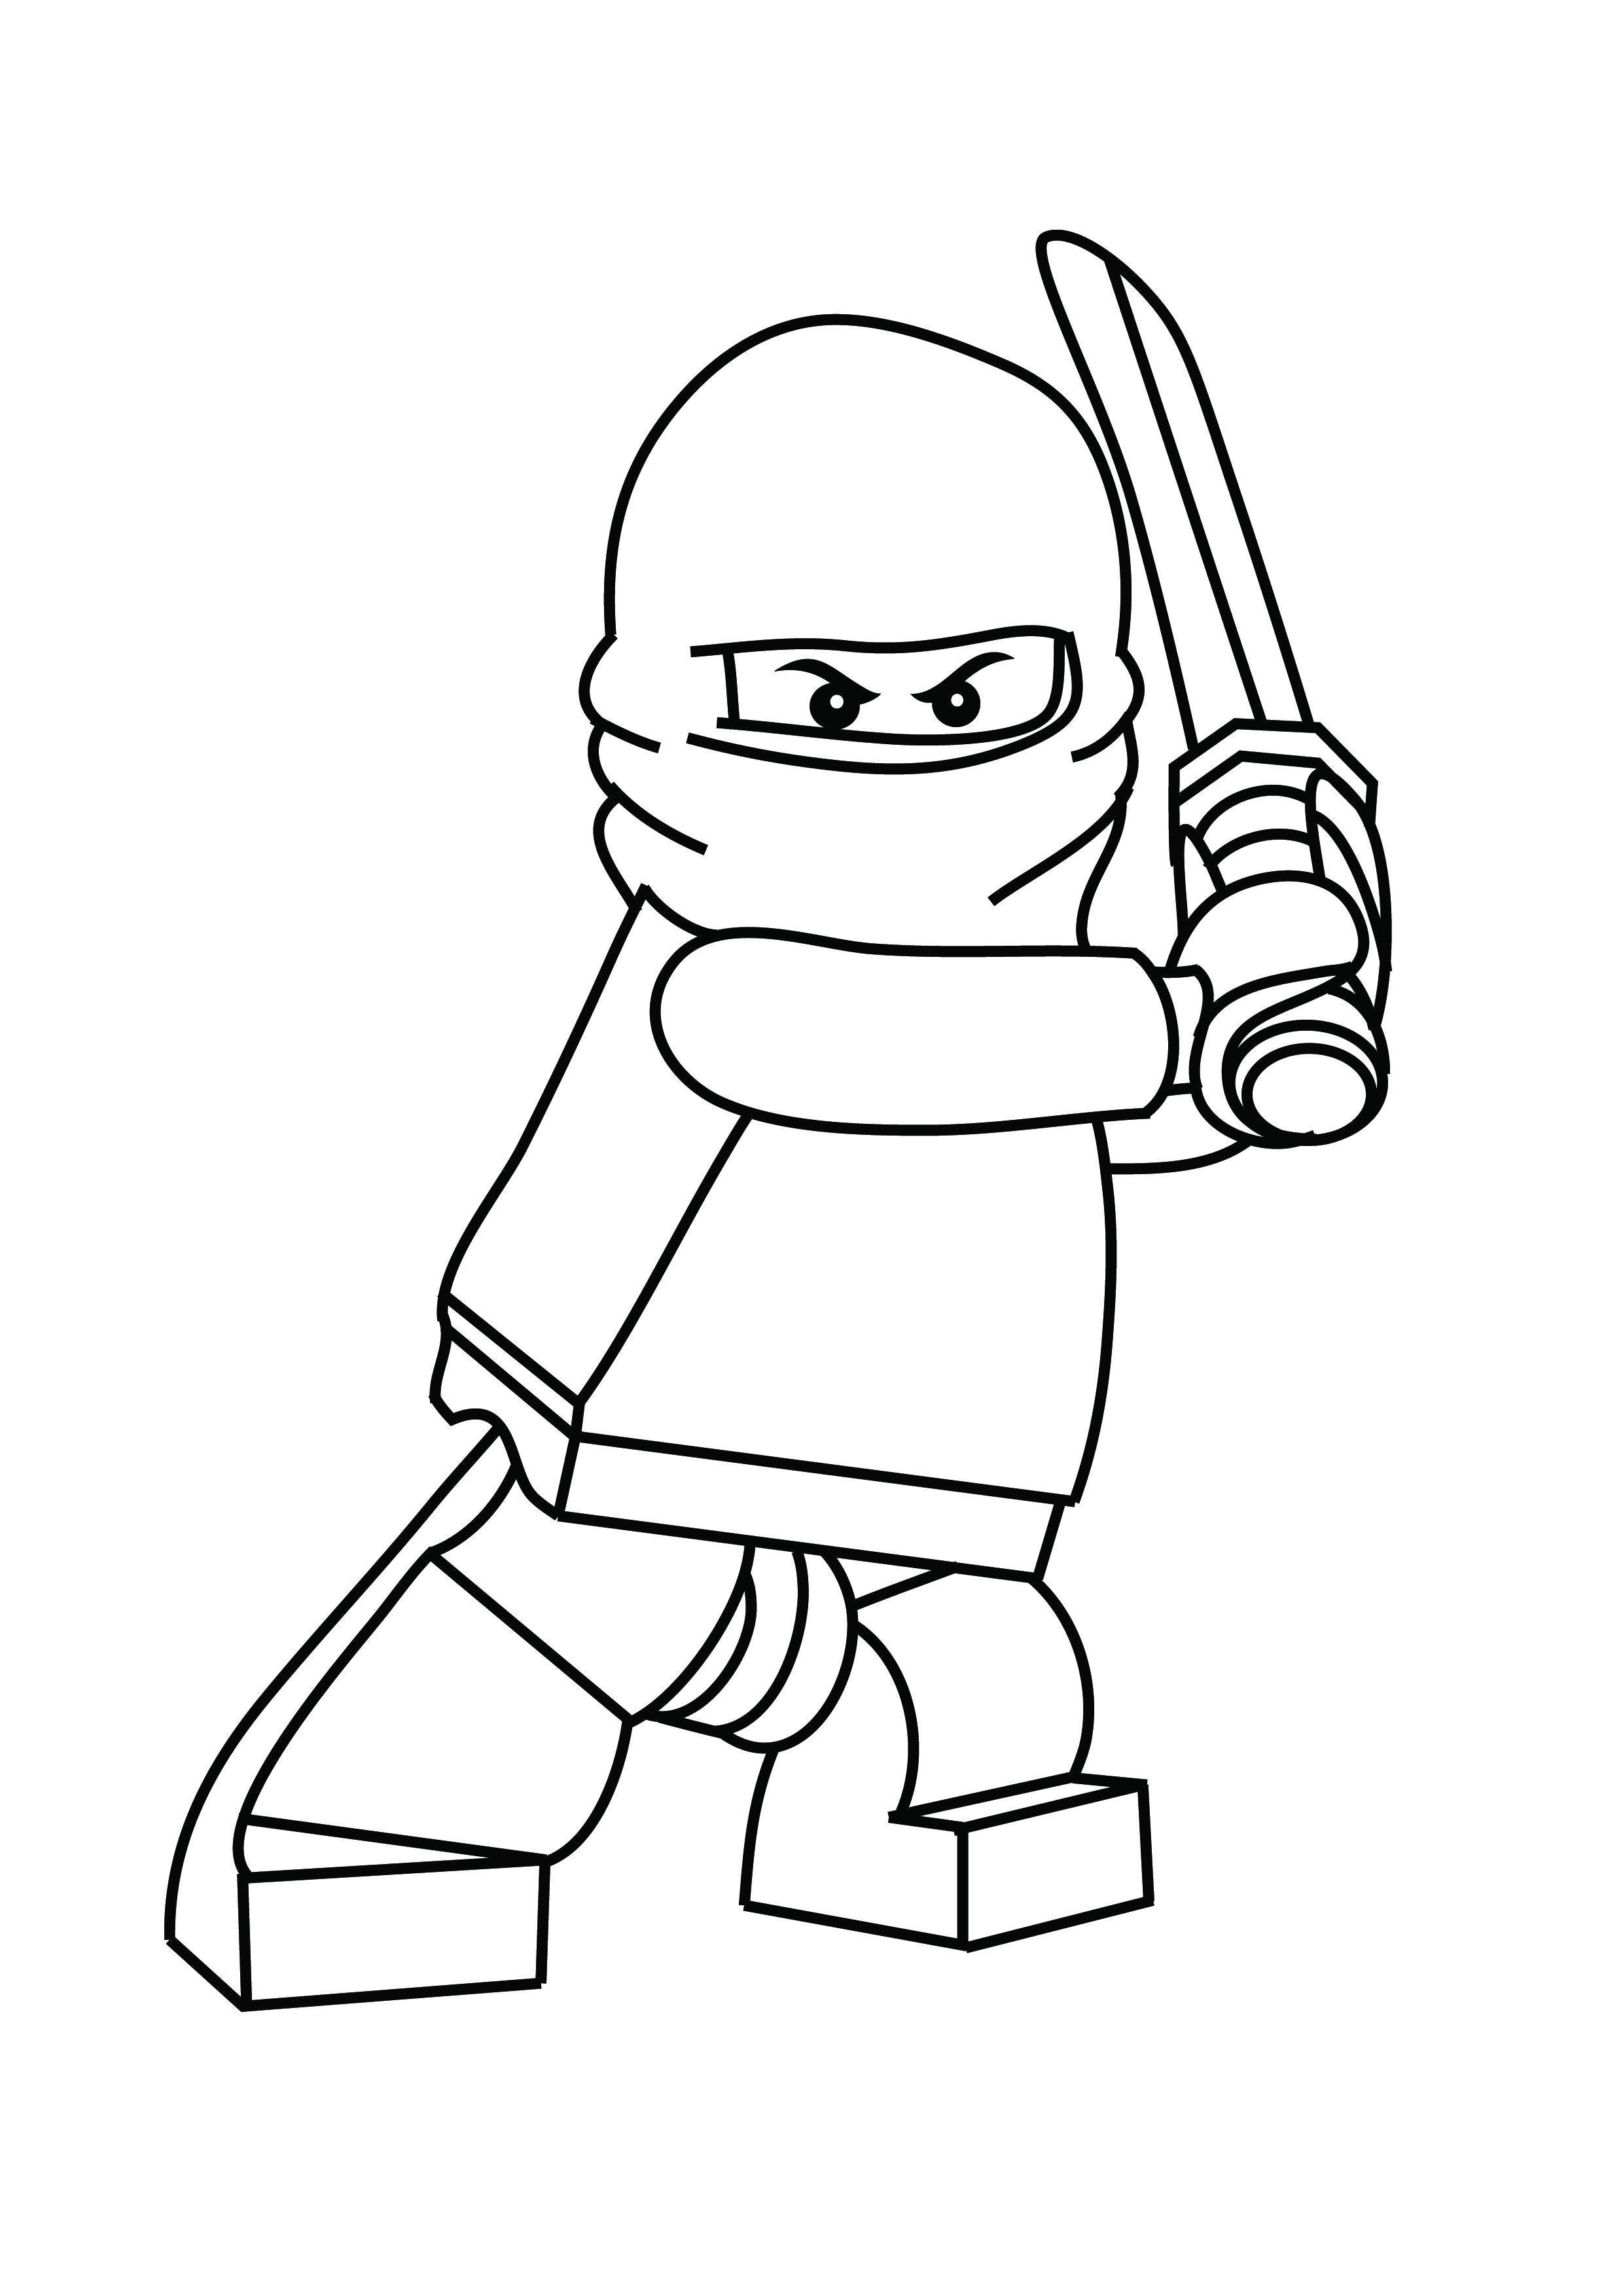 lego ninjago printables lego ninjago coloring pages best coloring pages for kids lego printables ninjago